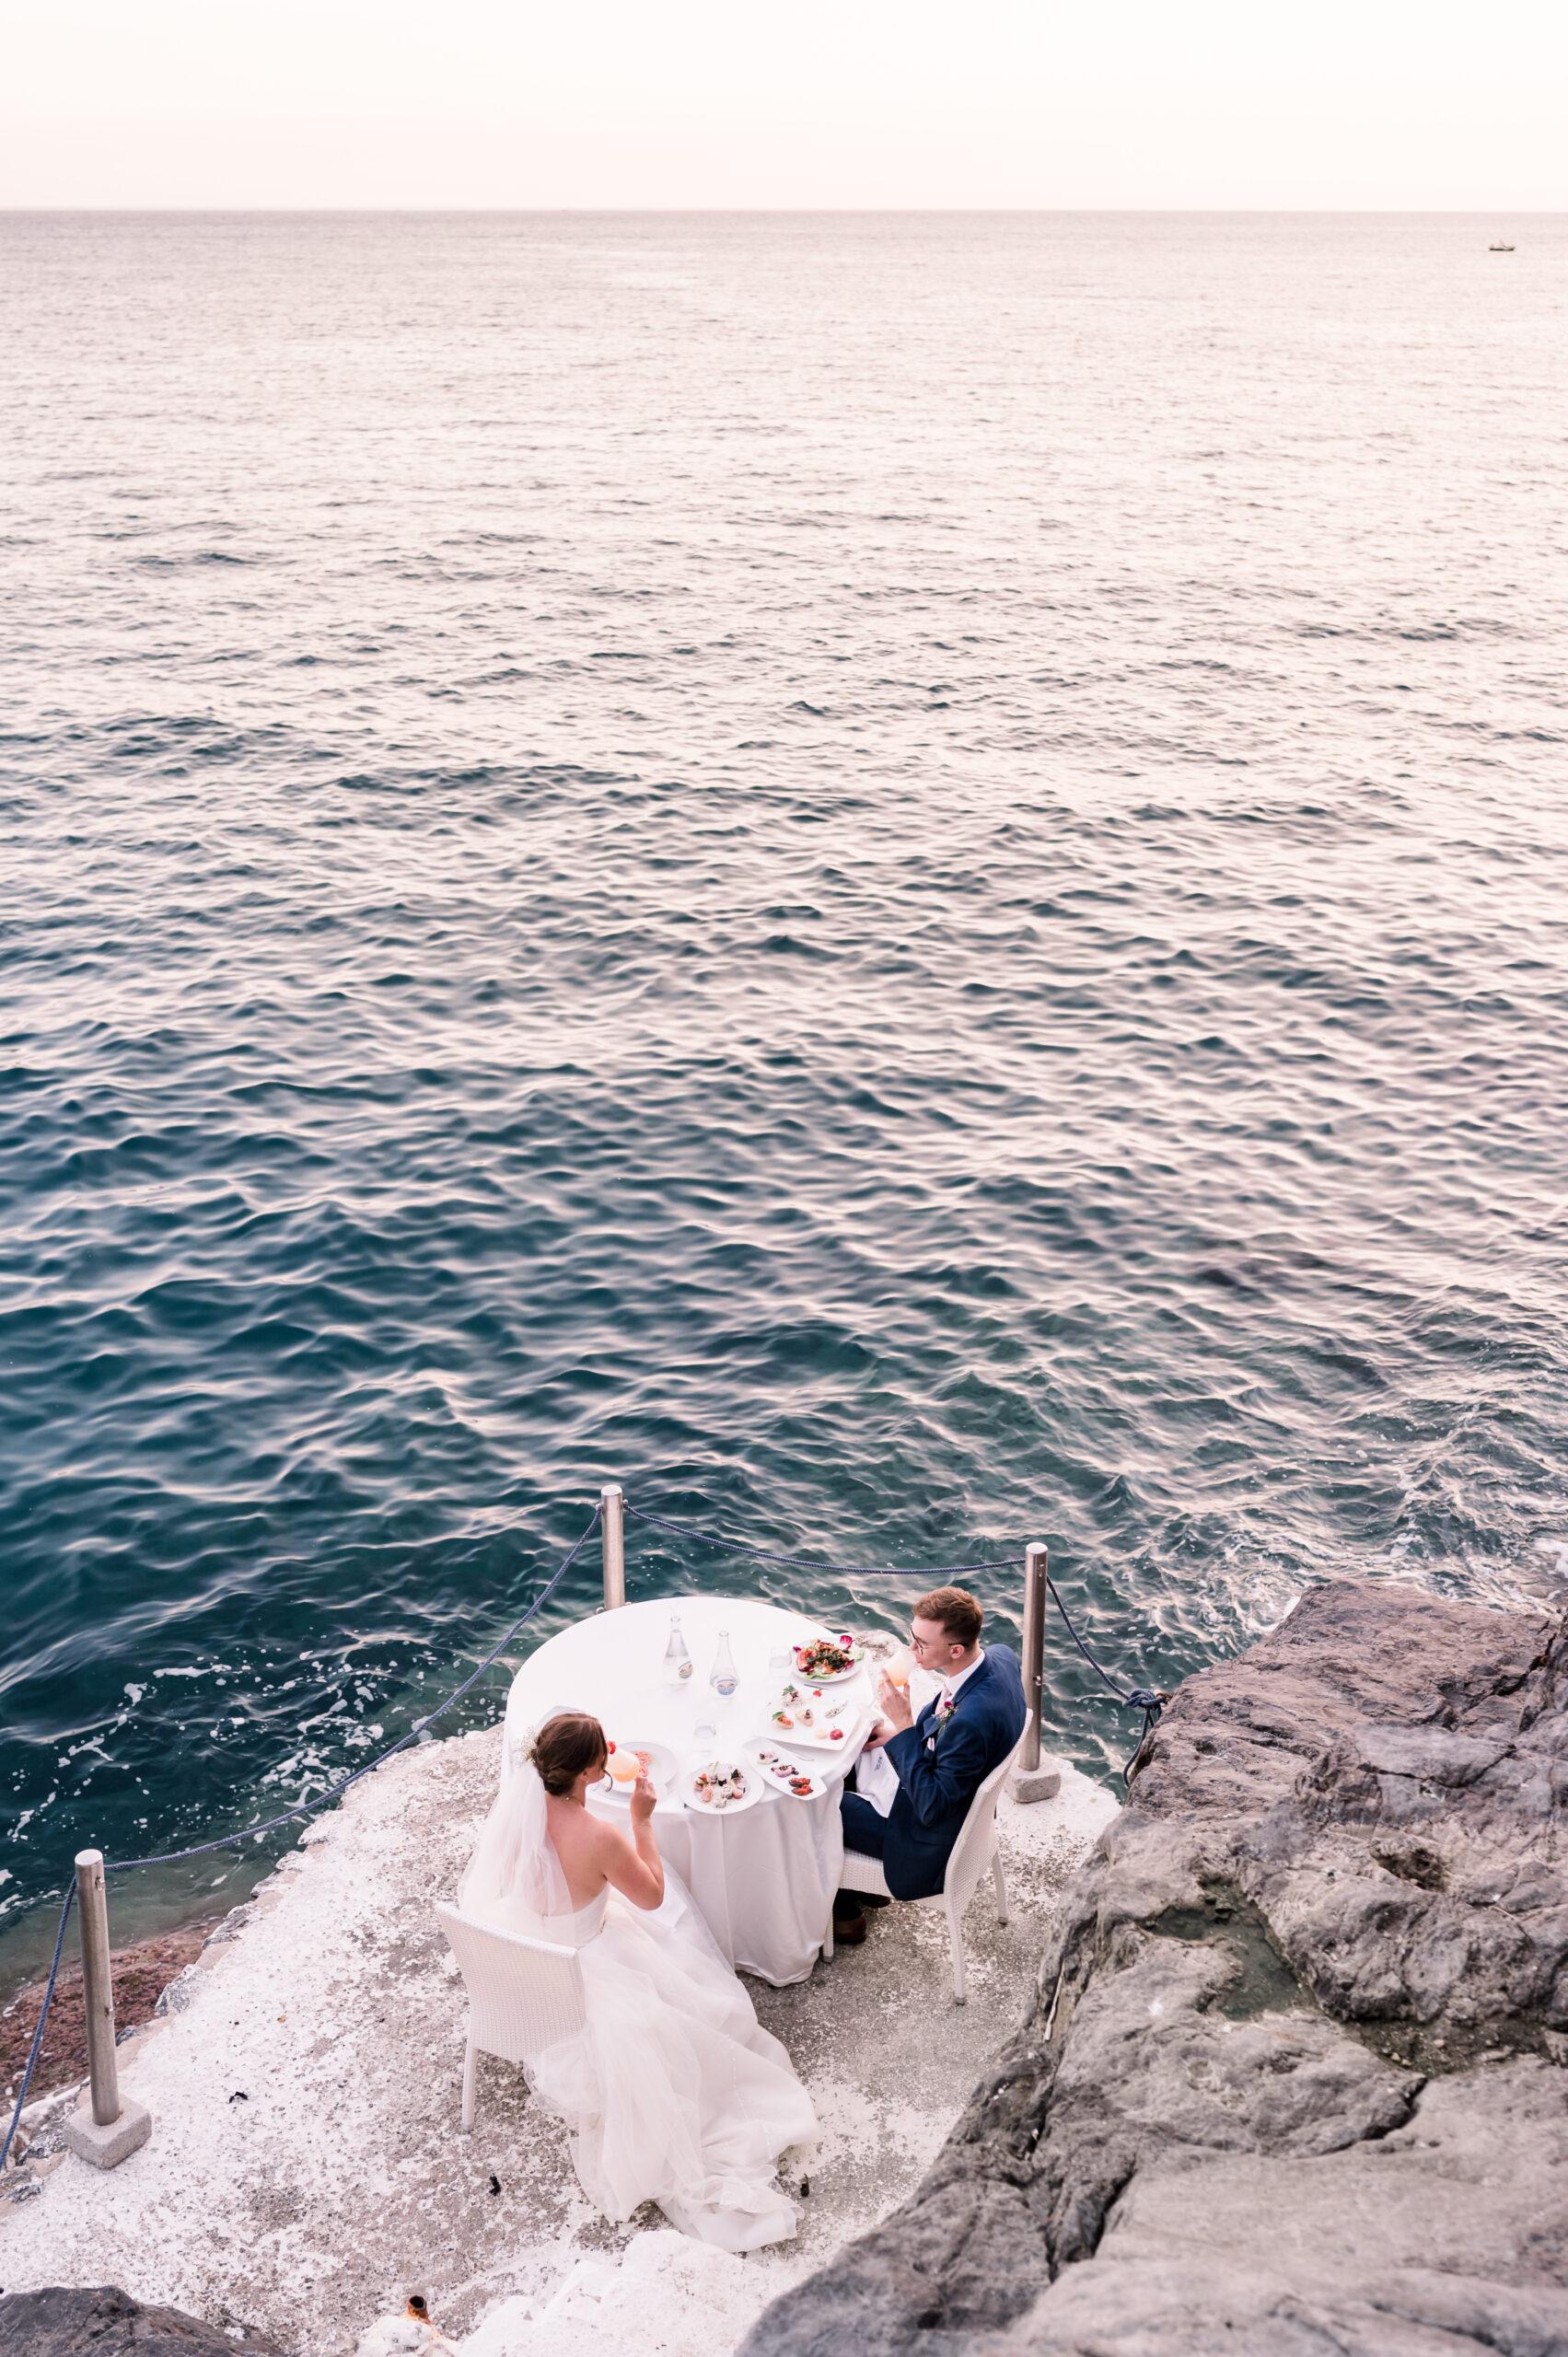 Ben and Holly wedding in Maiori, Amalfi Coast, Italy (5)